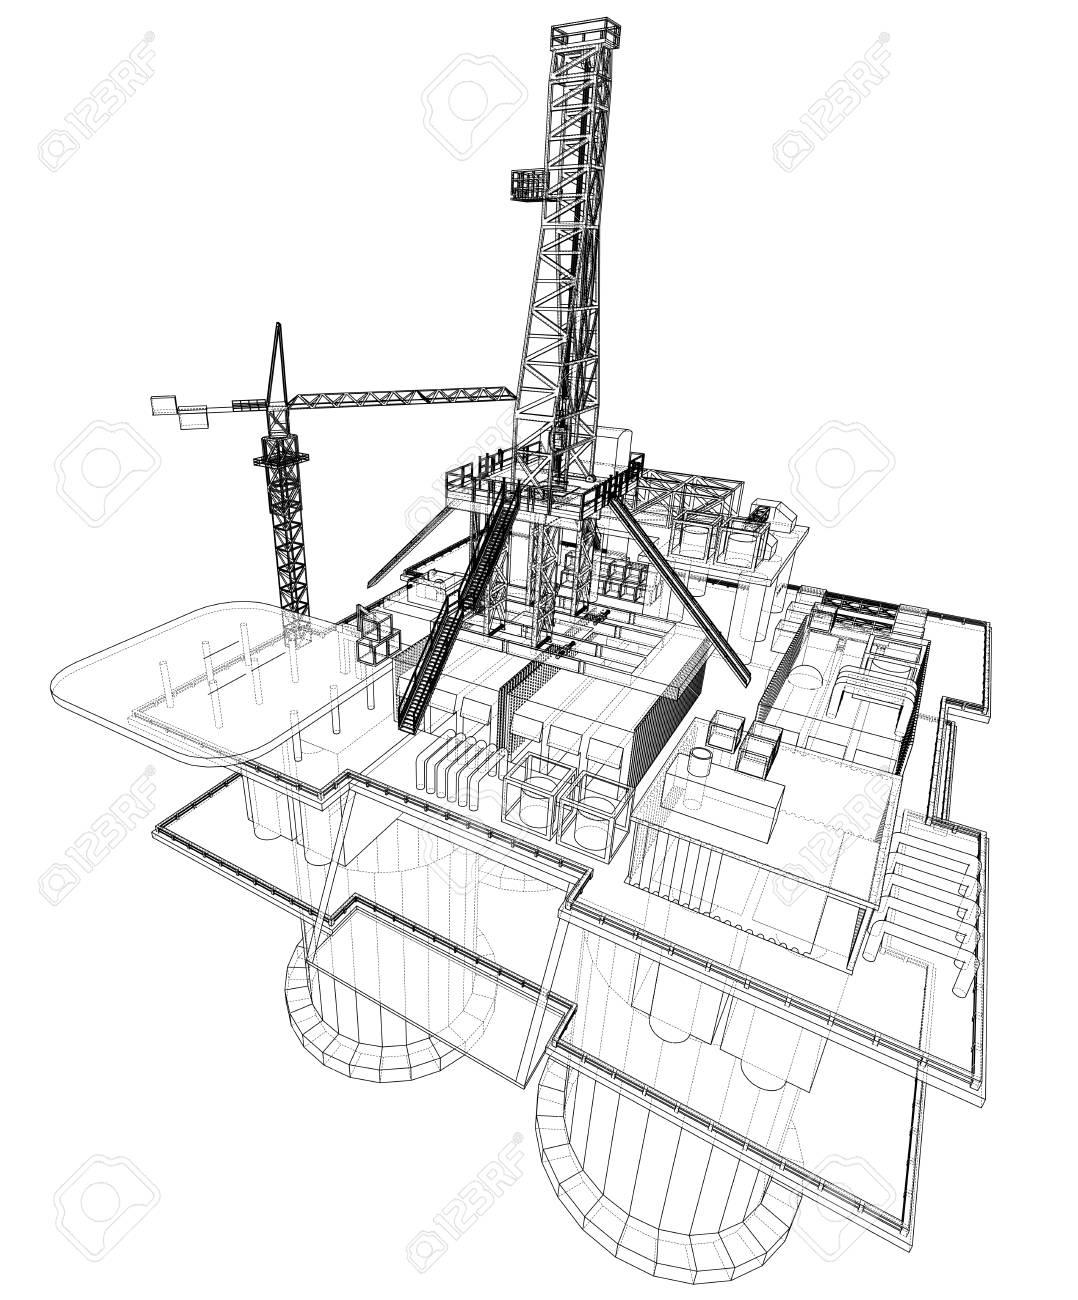 Offs oil rig drilling platform concept. Vector Ocean Drilling Rig Schematic Diagram on